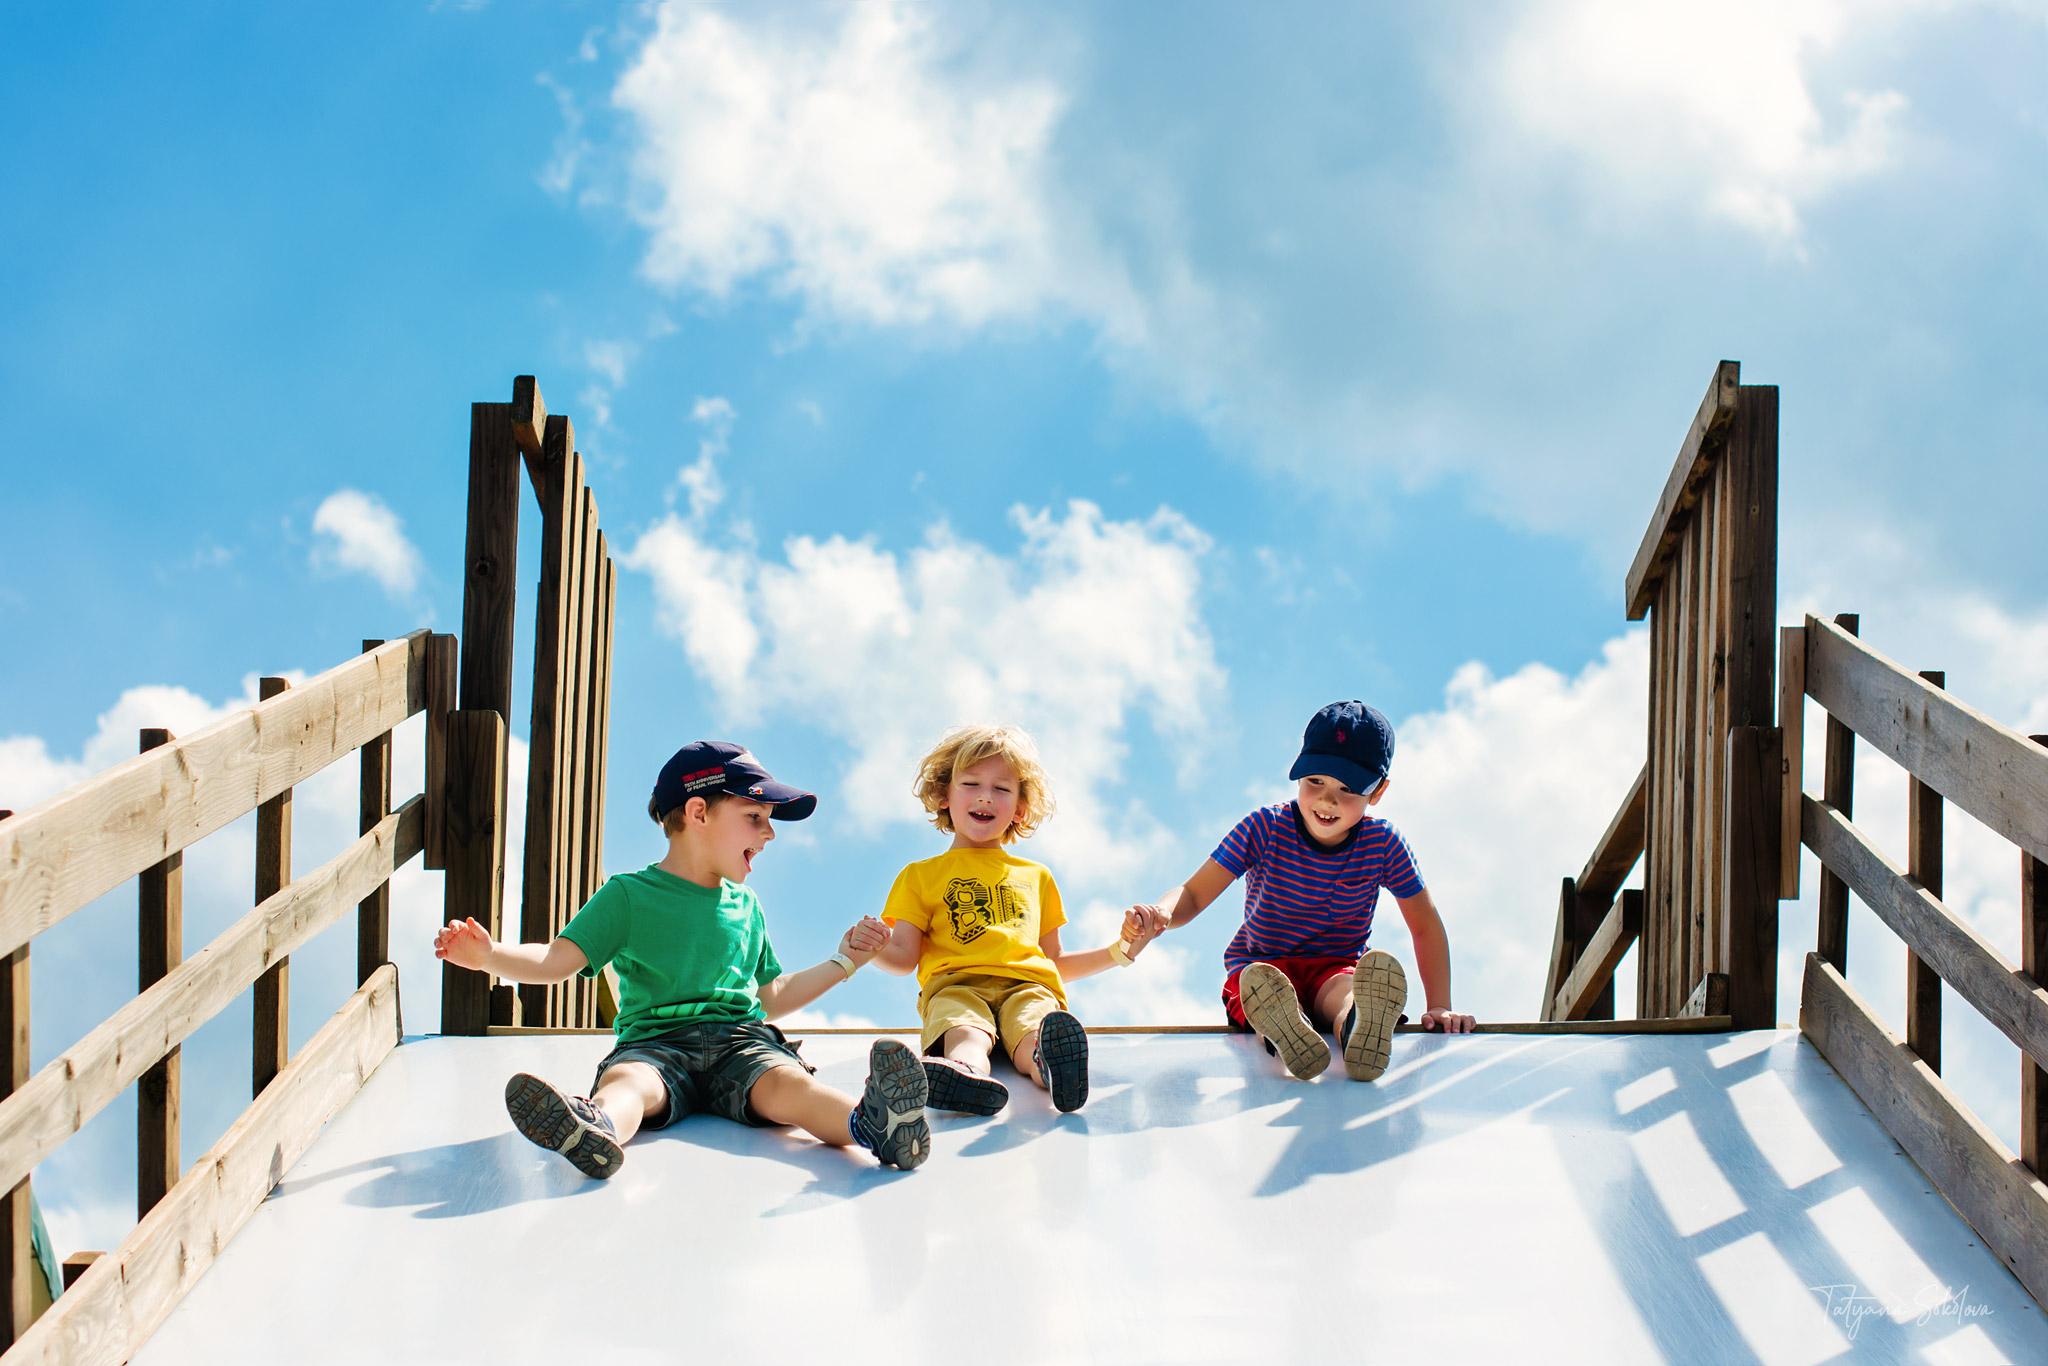 Houston Child Photographer; Houston Family Photographer; Family Photo Sessions in Houston